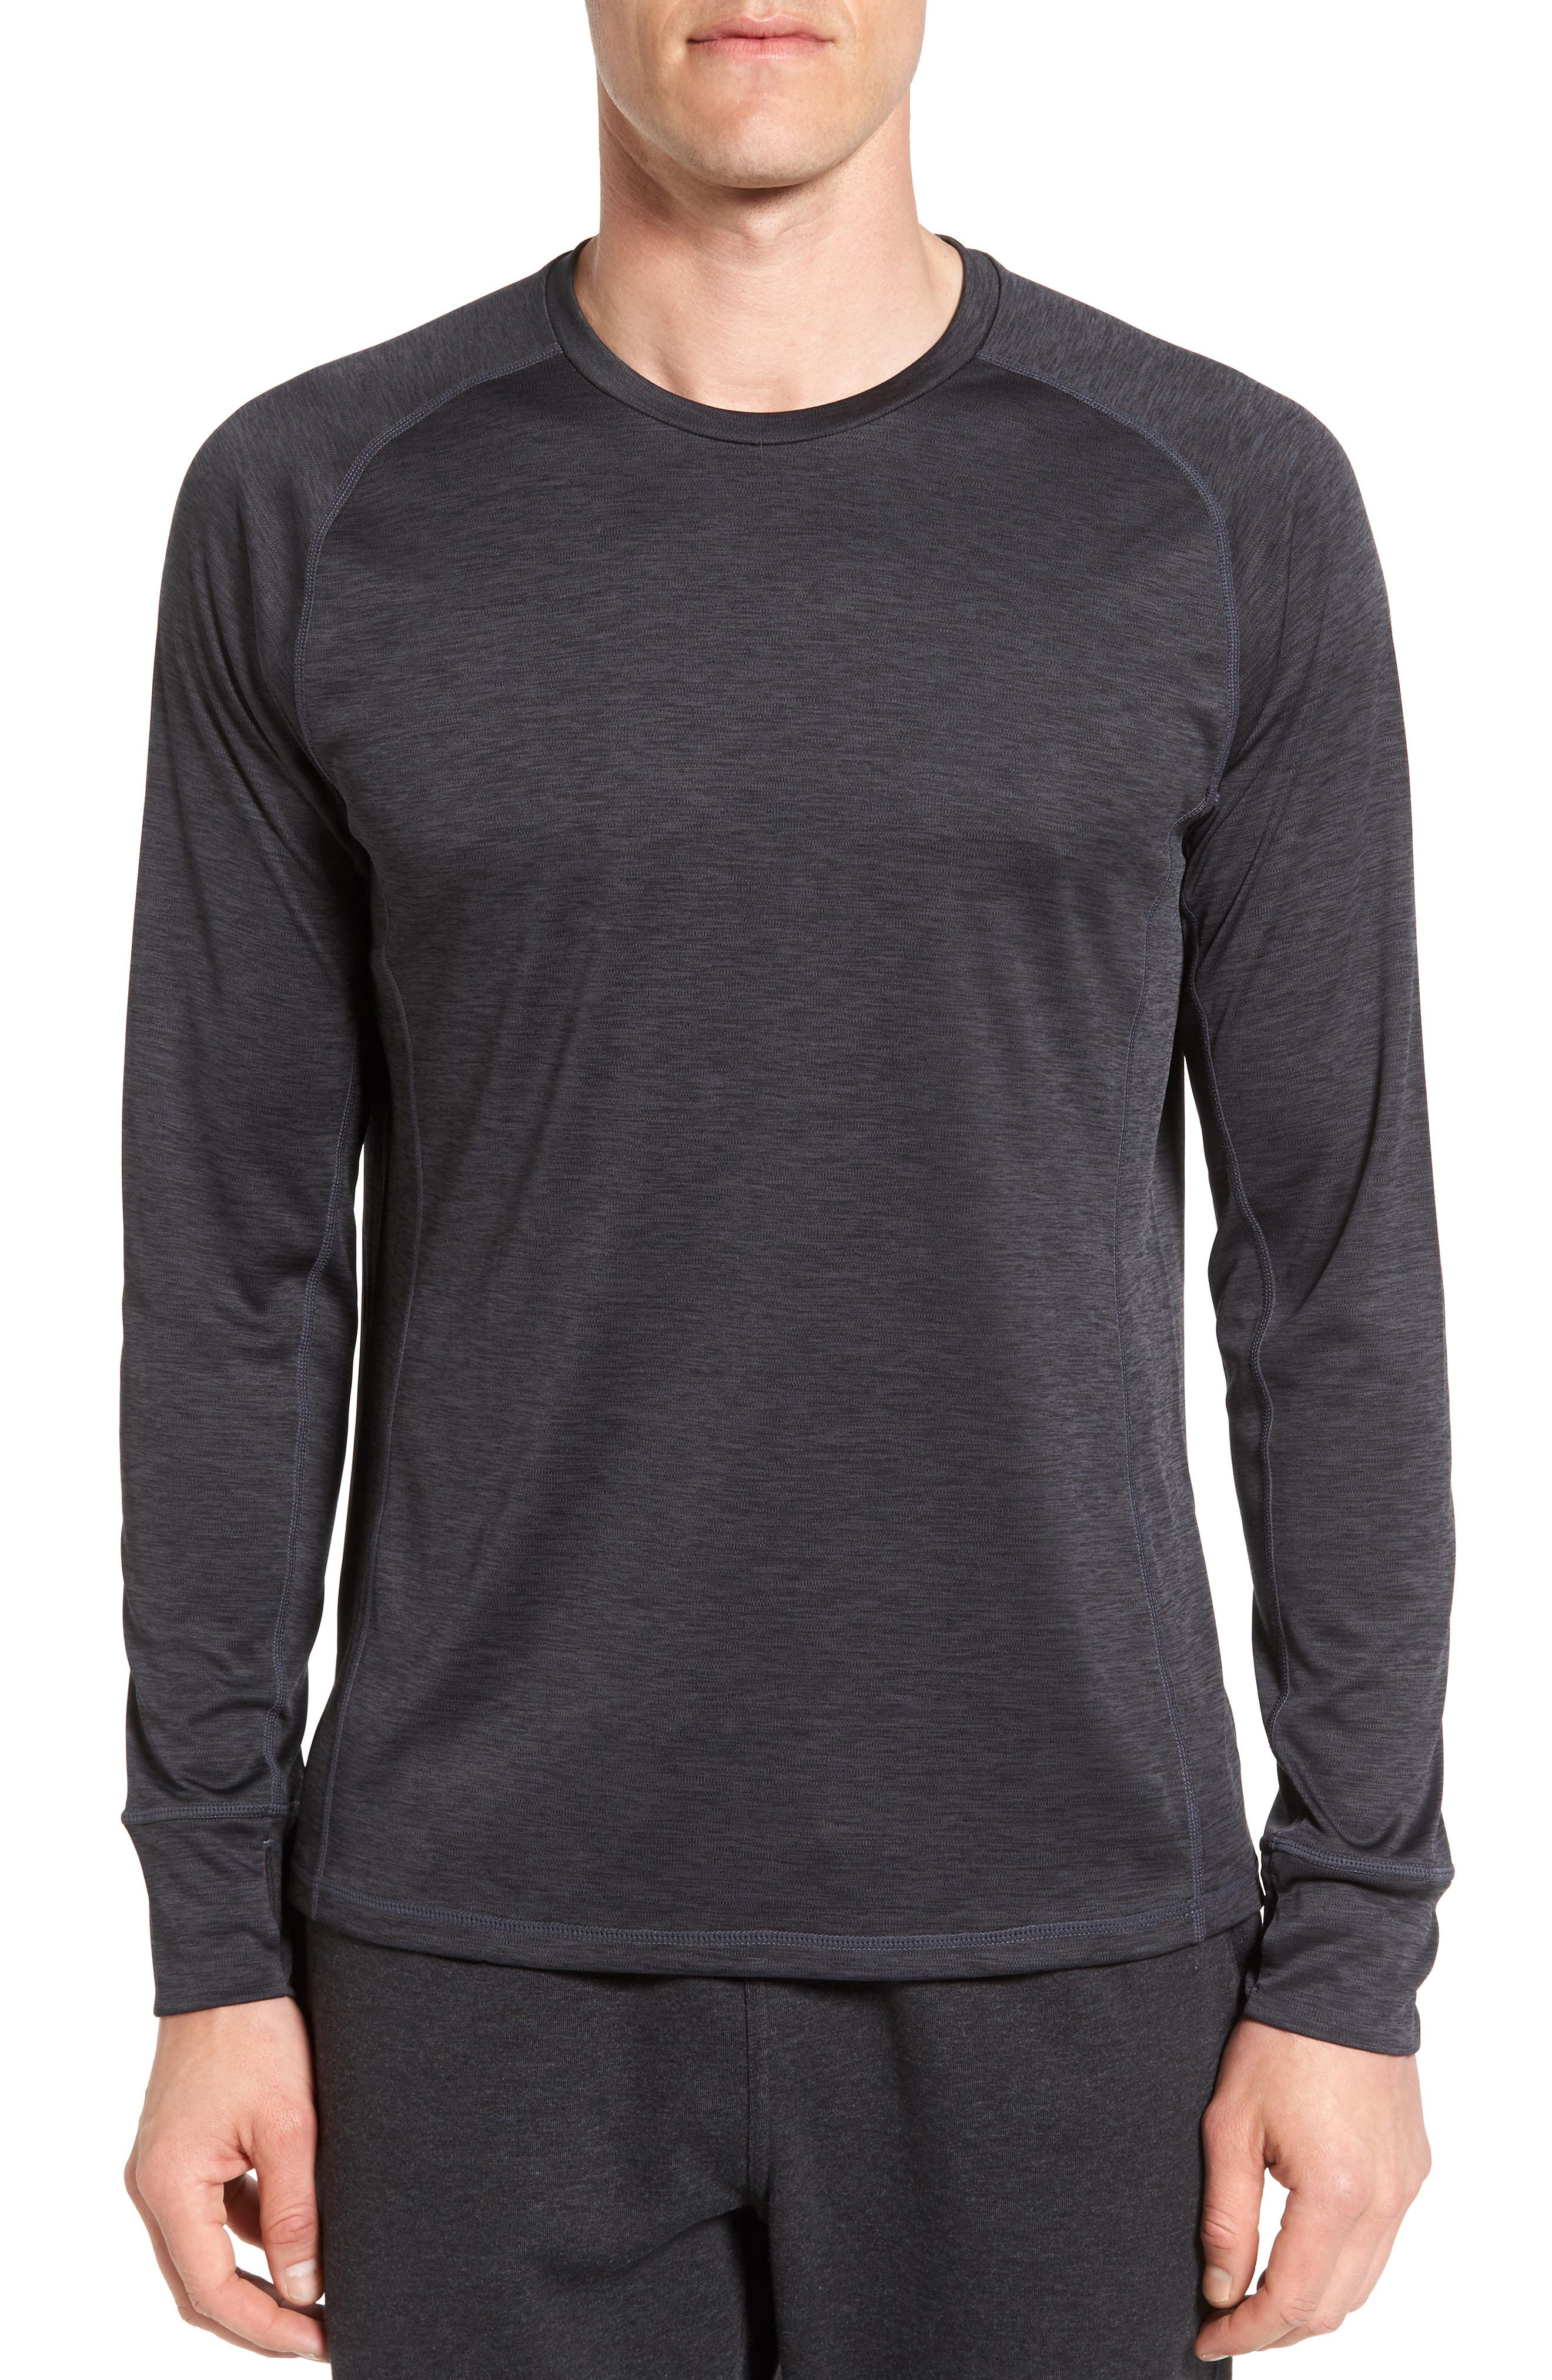 Zella Triplite Long Sleeve T-Shirt